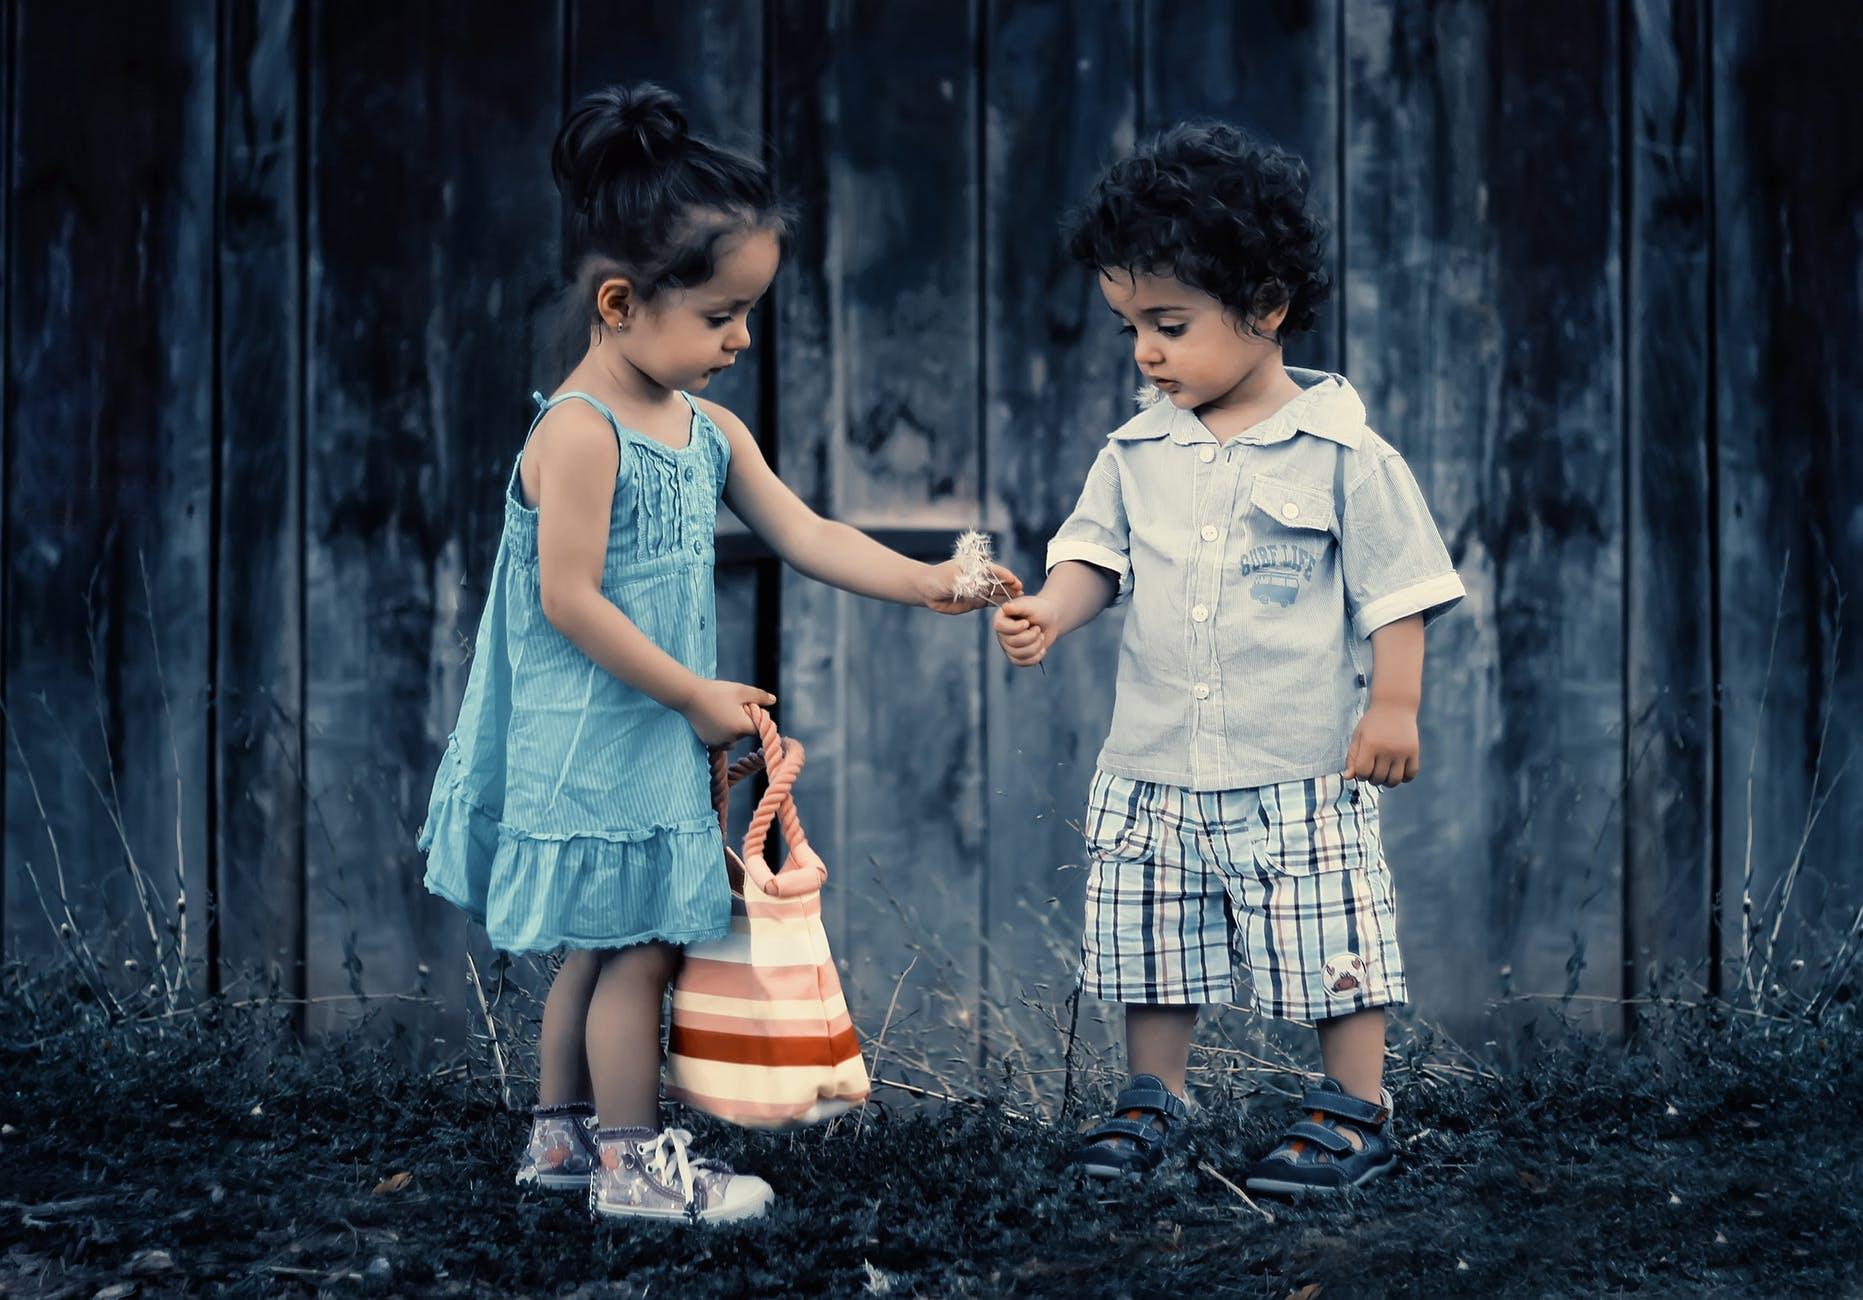 children sharing generosity